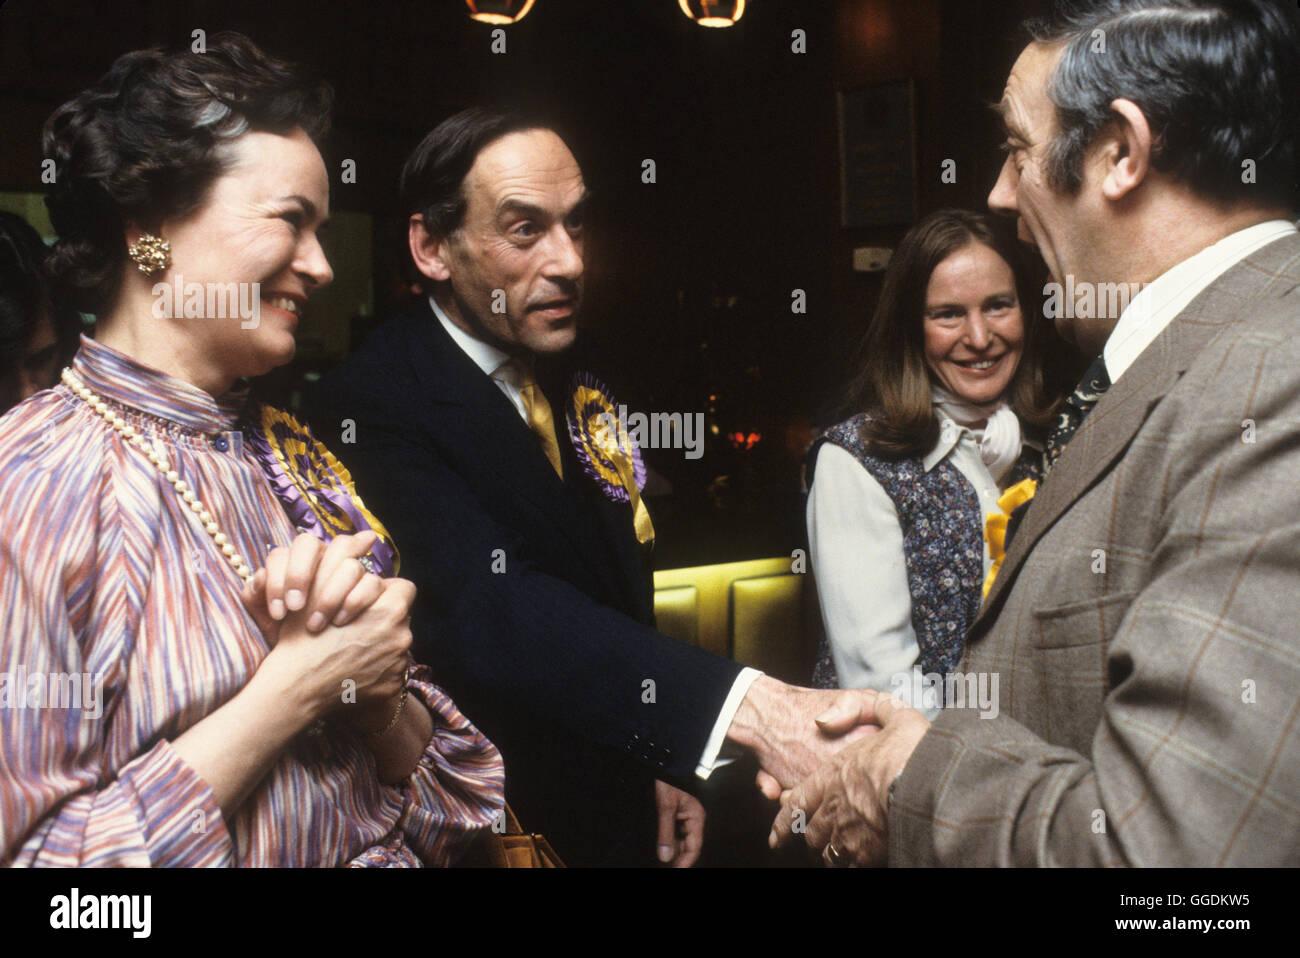 Jeremy Thorpe MP and wife Marion Thorpe  1979 Devon UK HOMER SYKES - Stock Image